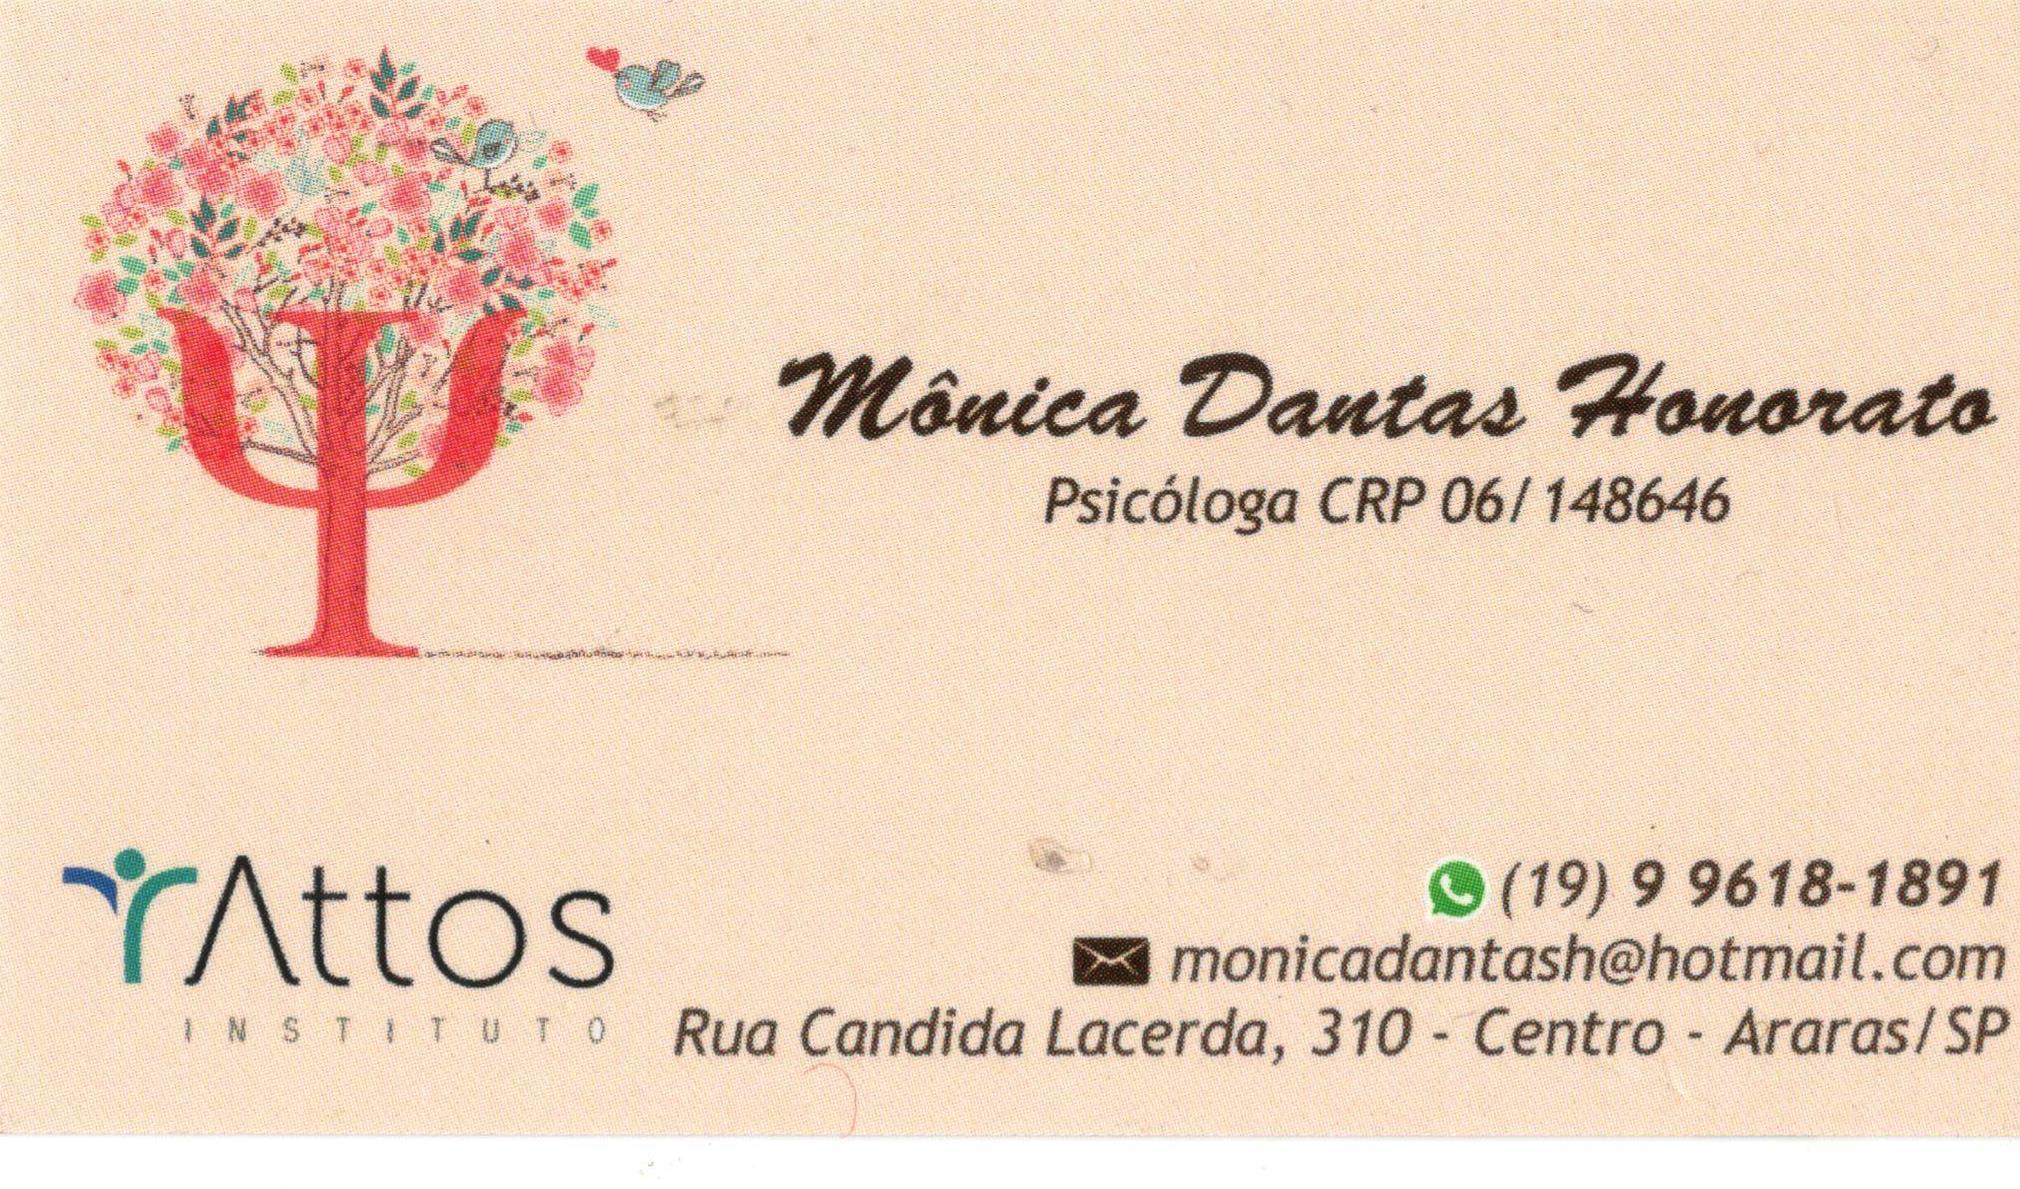 Mônica Dantas Honorato